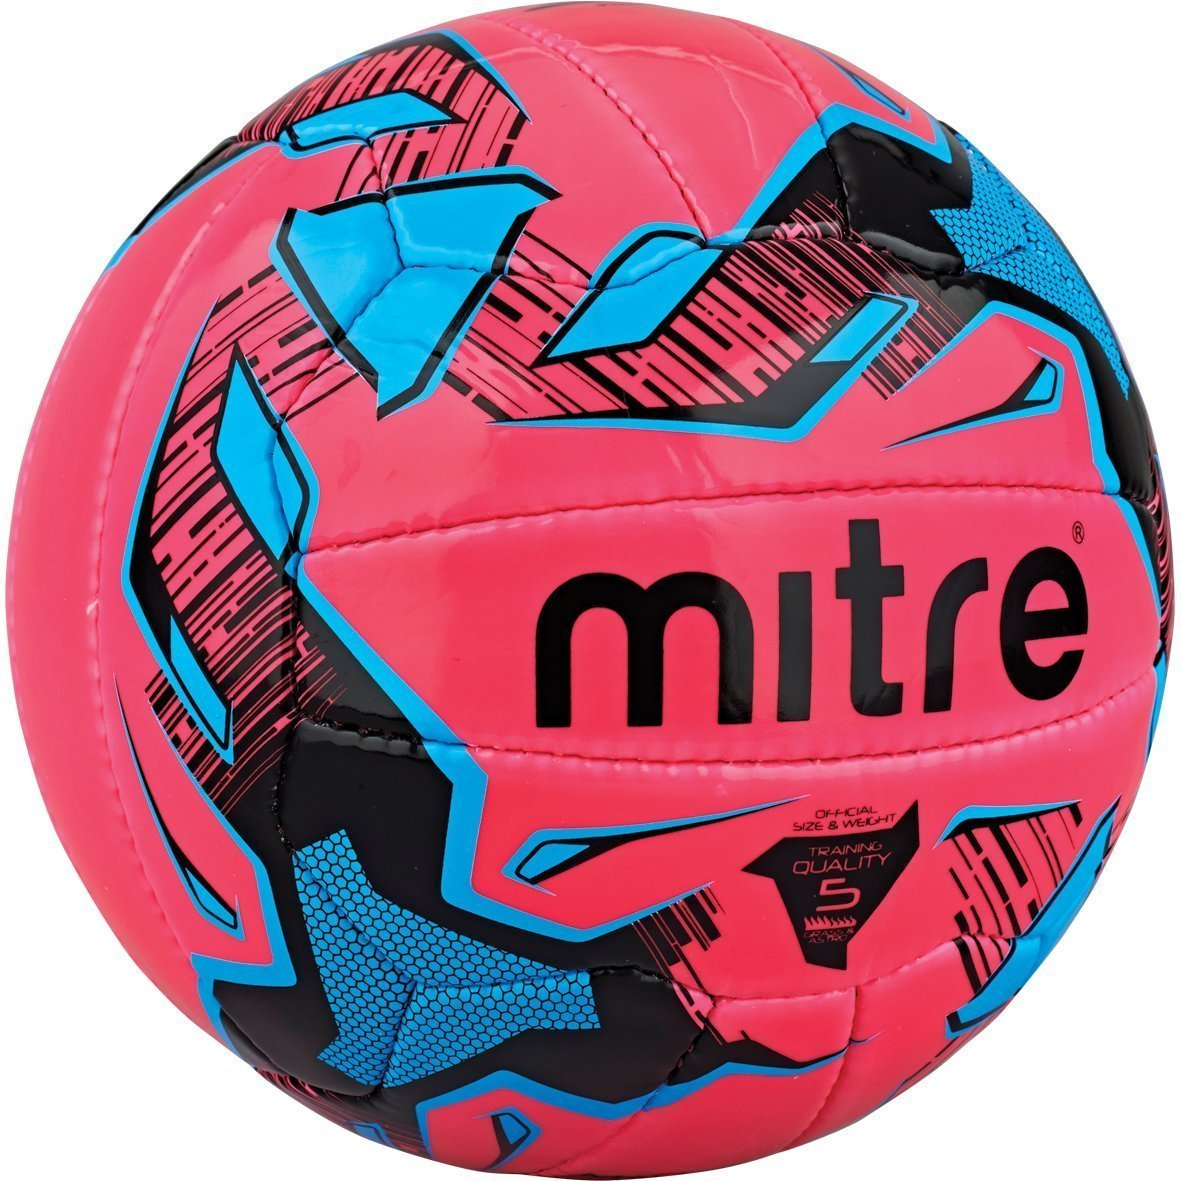 1181x1181 Mitre Malmo Training Football Amazon.co.uk Sports Amp Outdoors